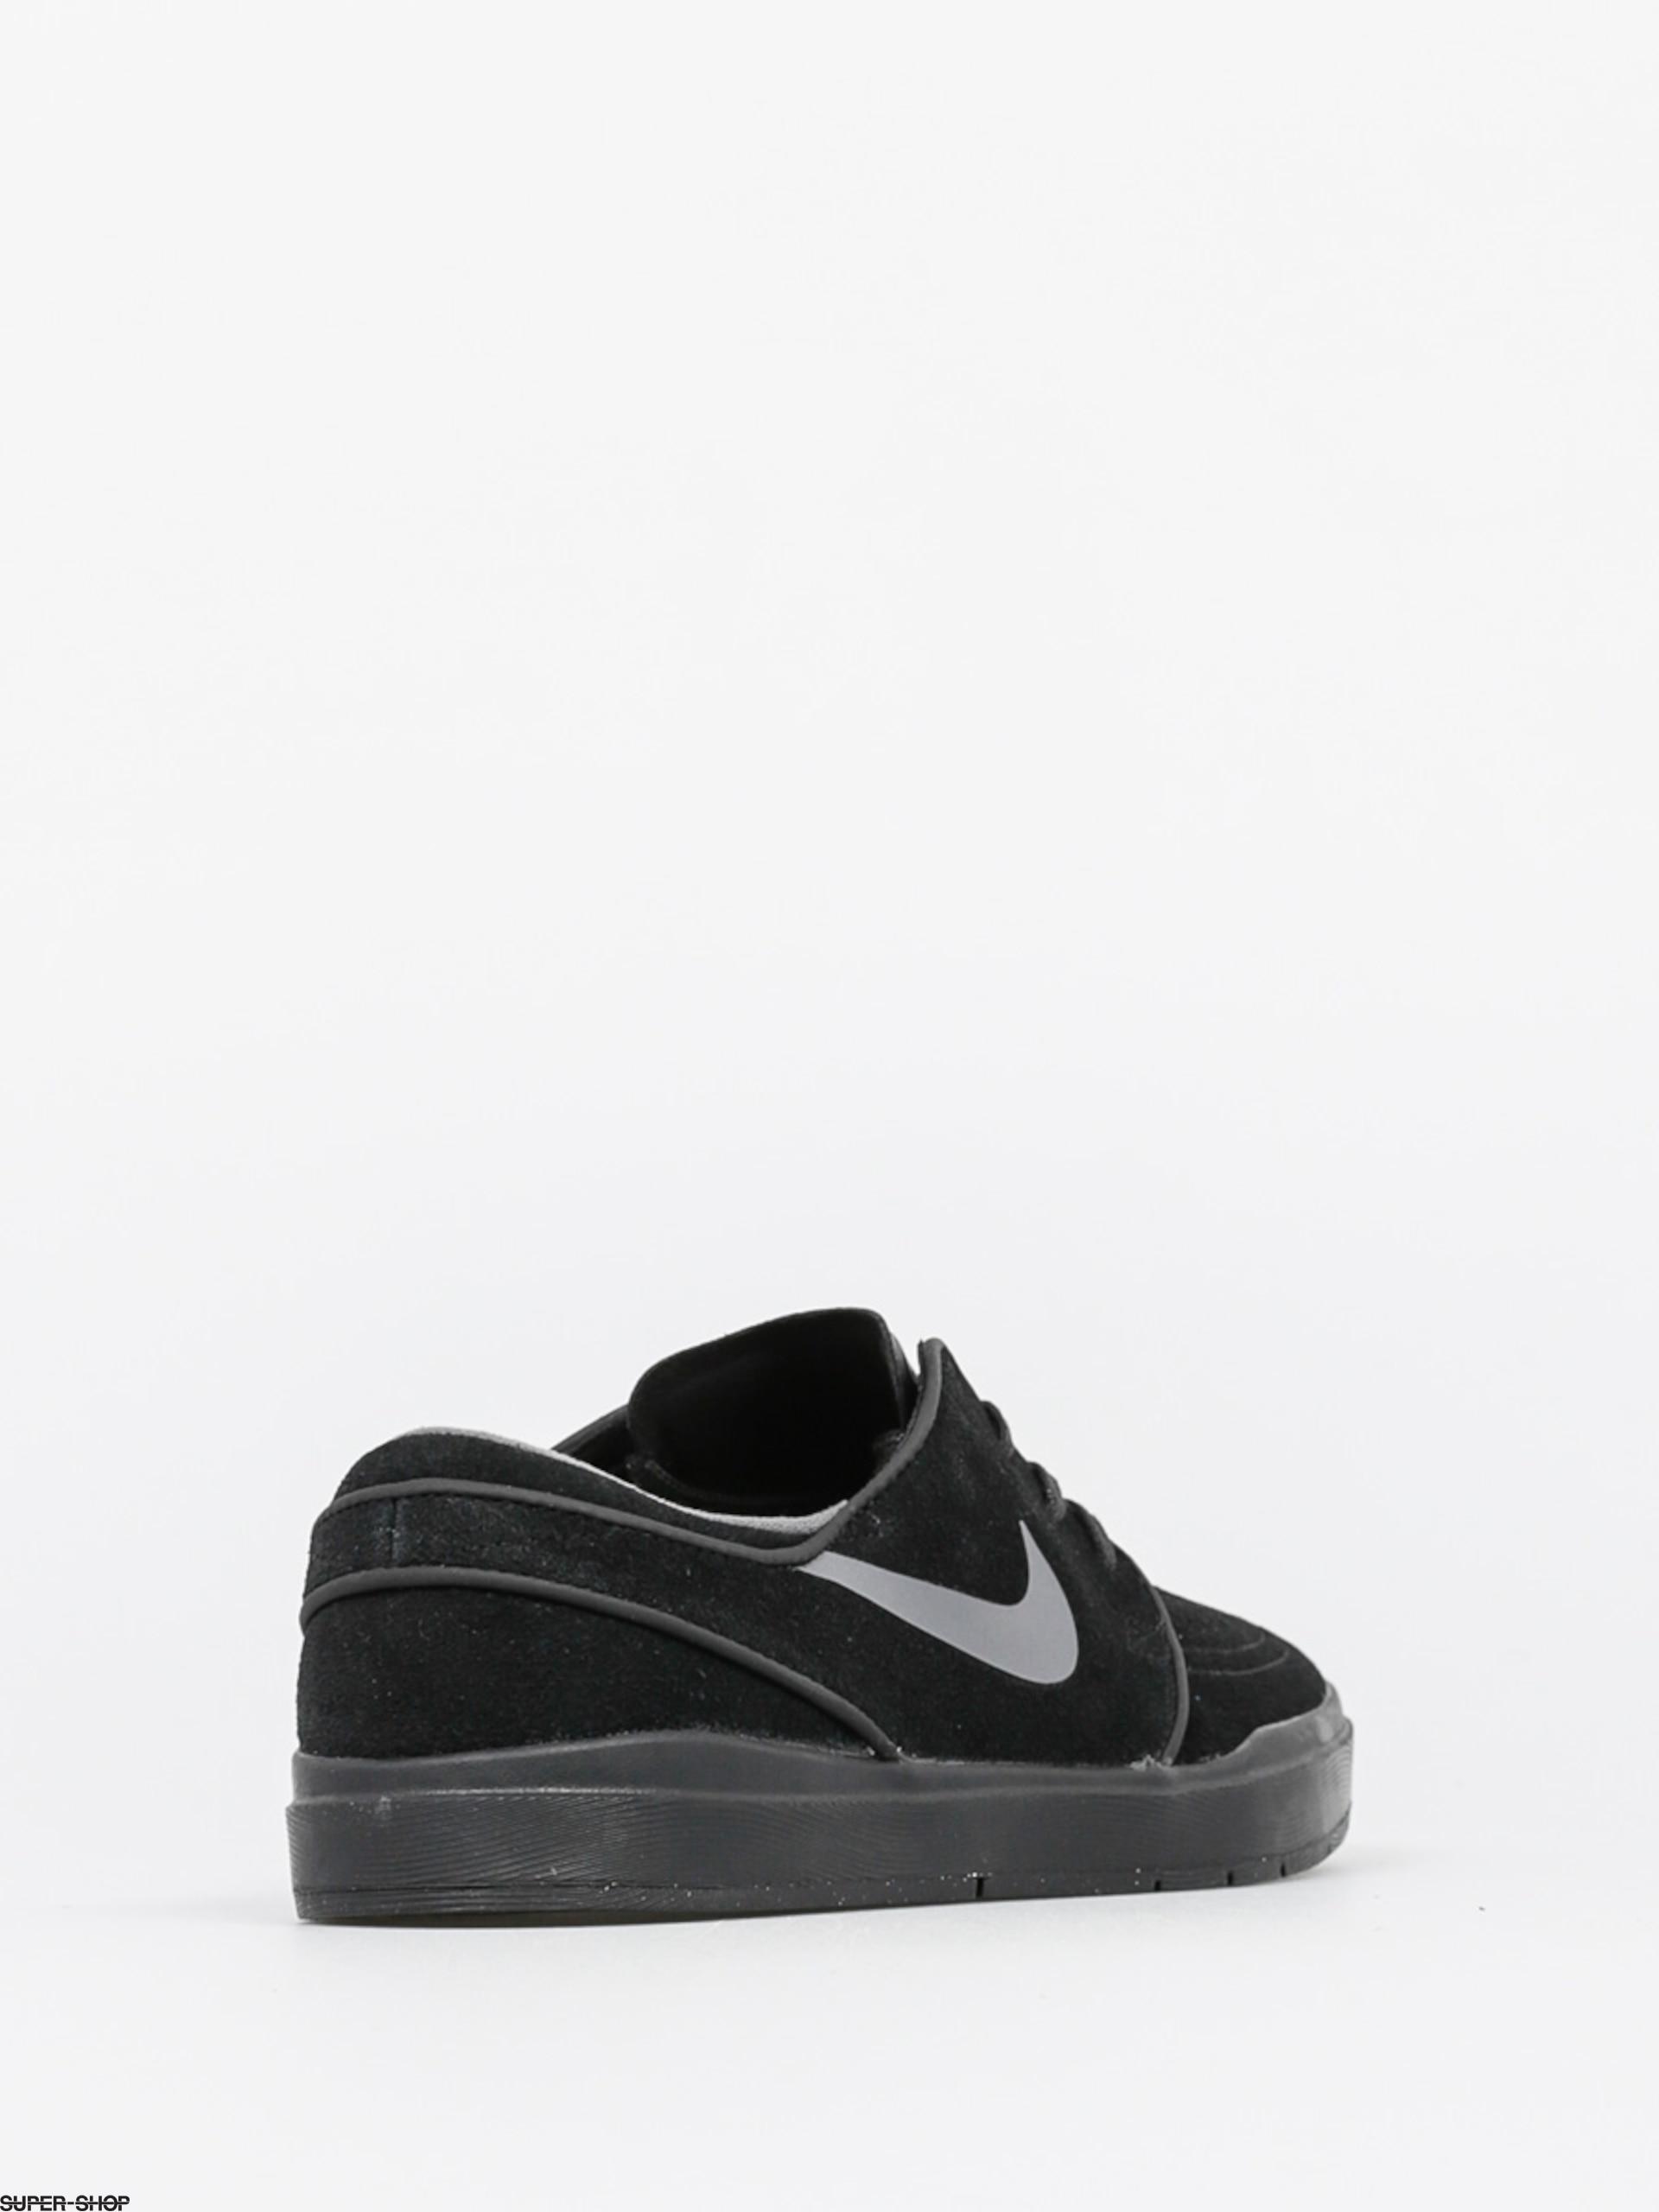 partícula Mm trama  Nike SB Shoes Stefan Janoski Hyperfeel (black/black anthracite black)